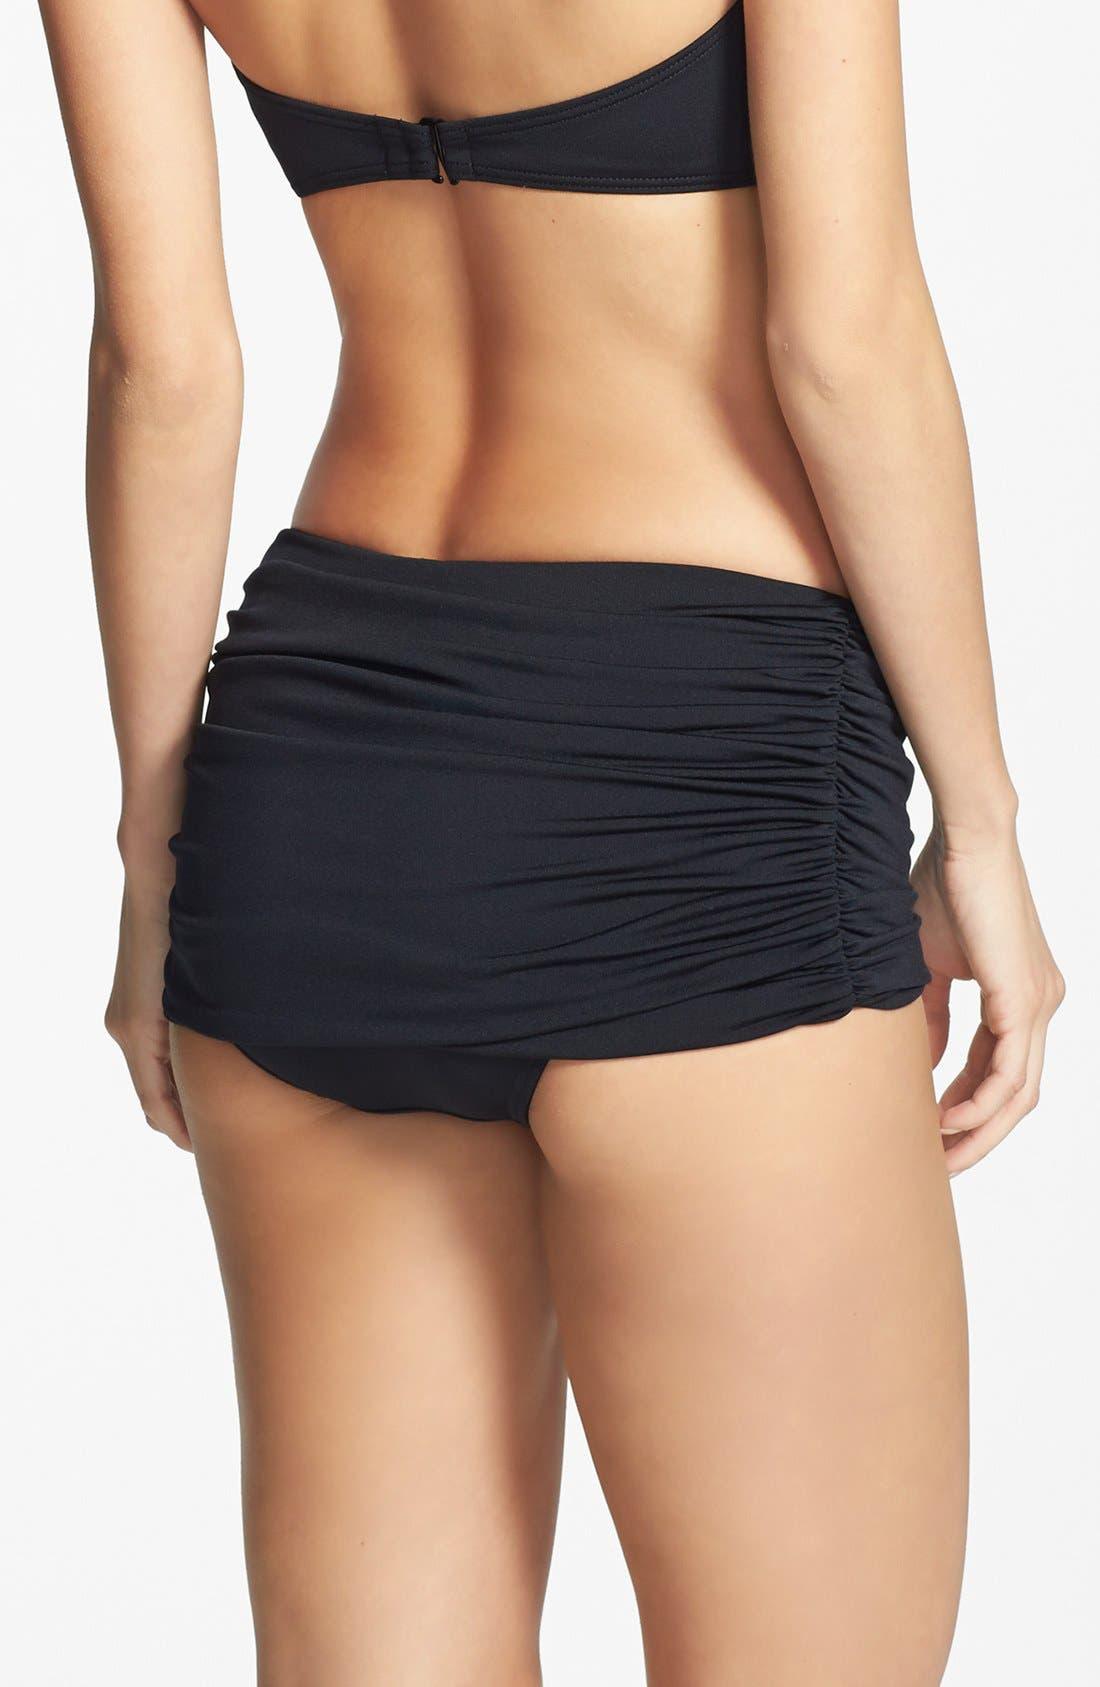 Carmen Marc Valvo 'Cape Town Beach' Shirred Skirted Bikini Bottoms,                             Alternate thumbnail 4, color,